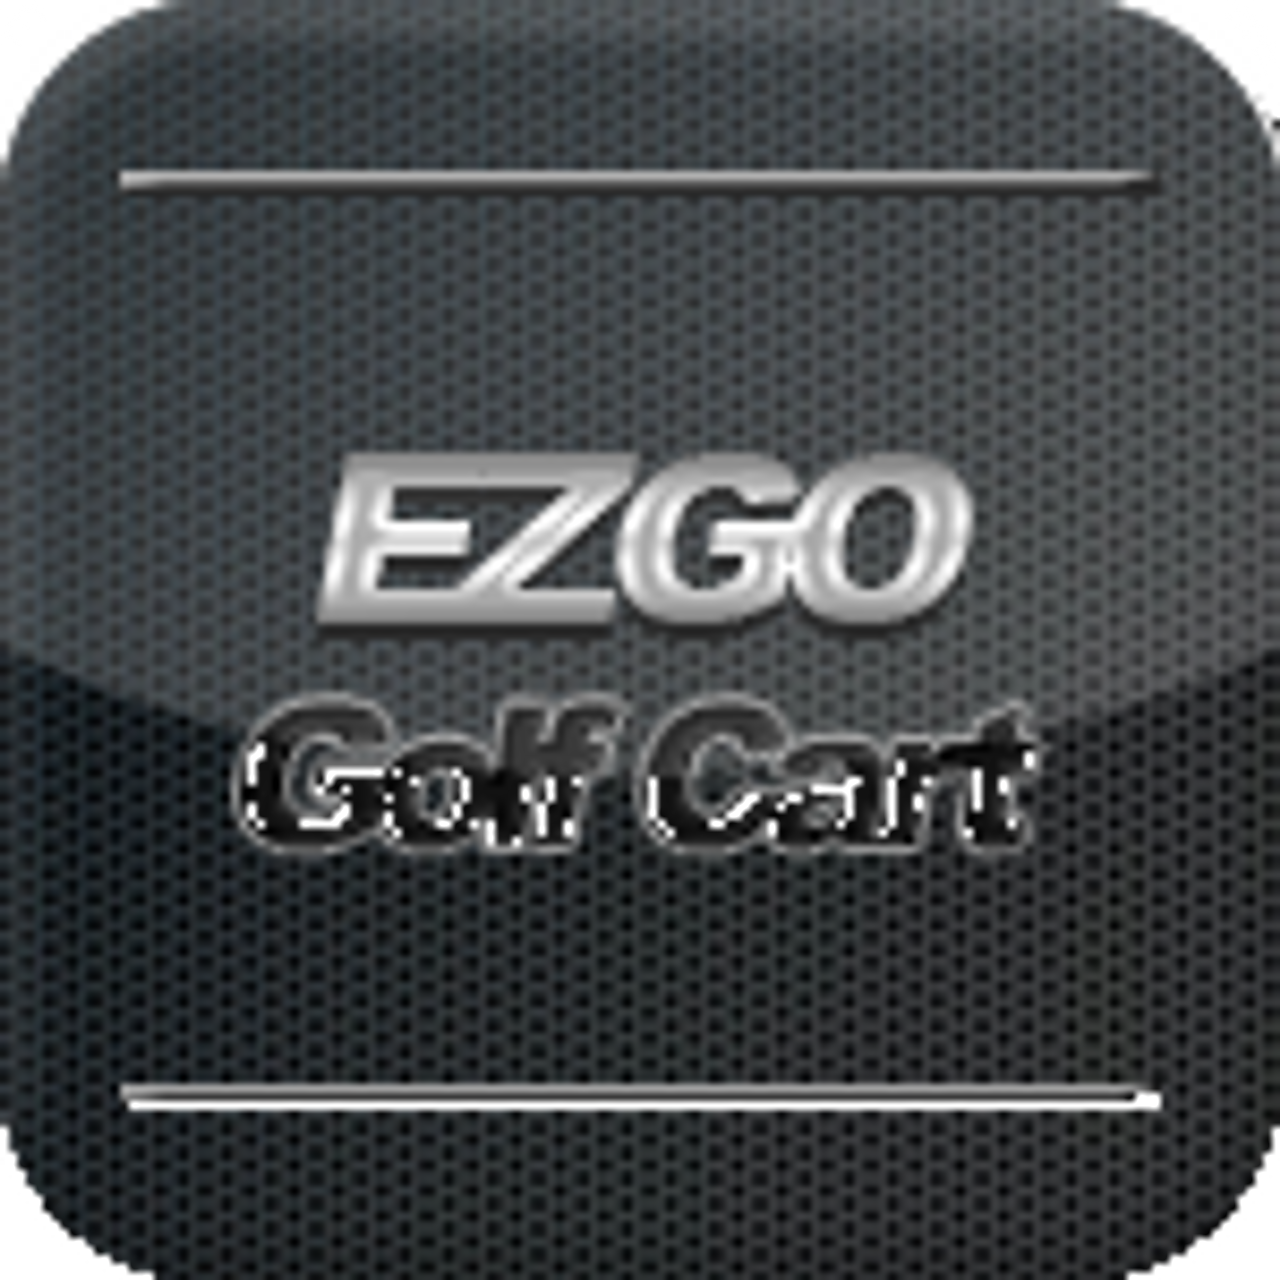 EZGO Hunting Accessories